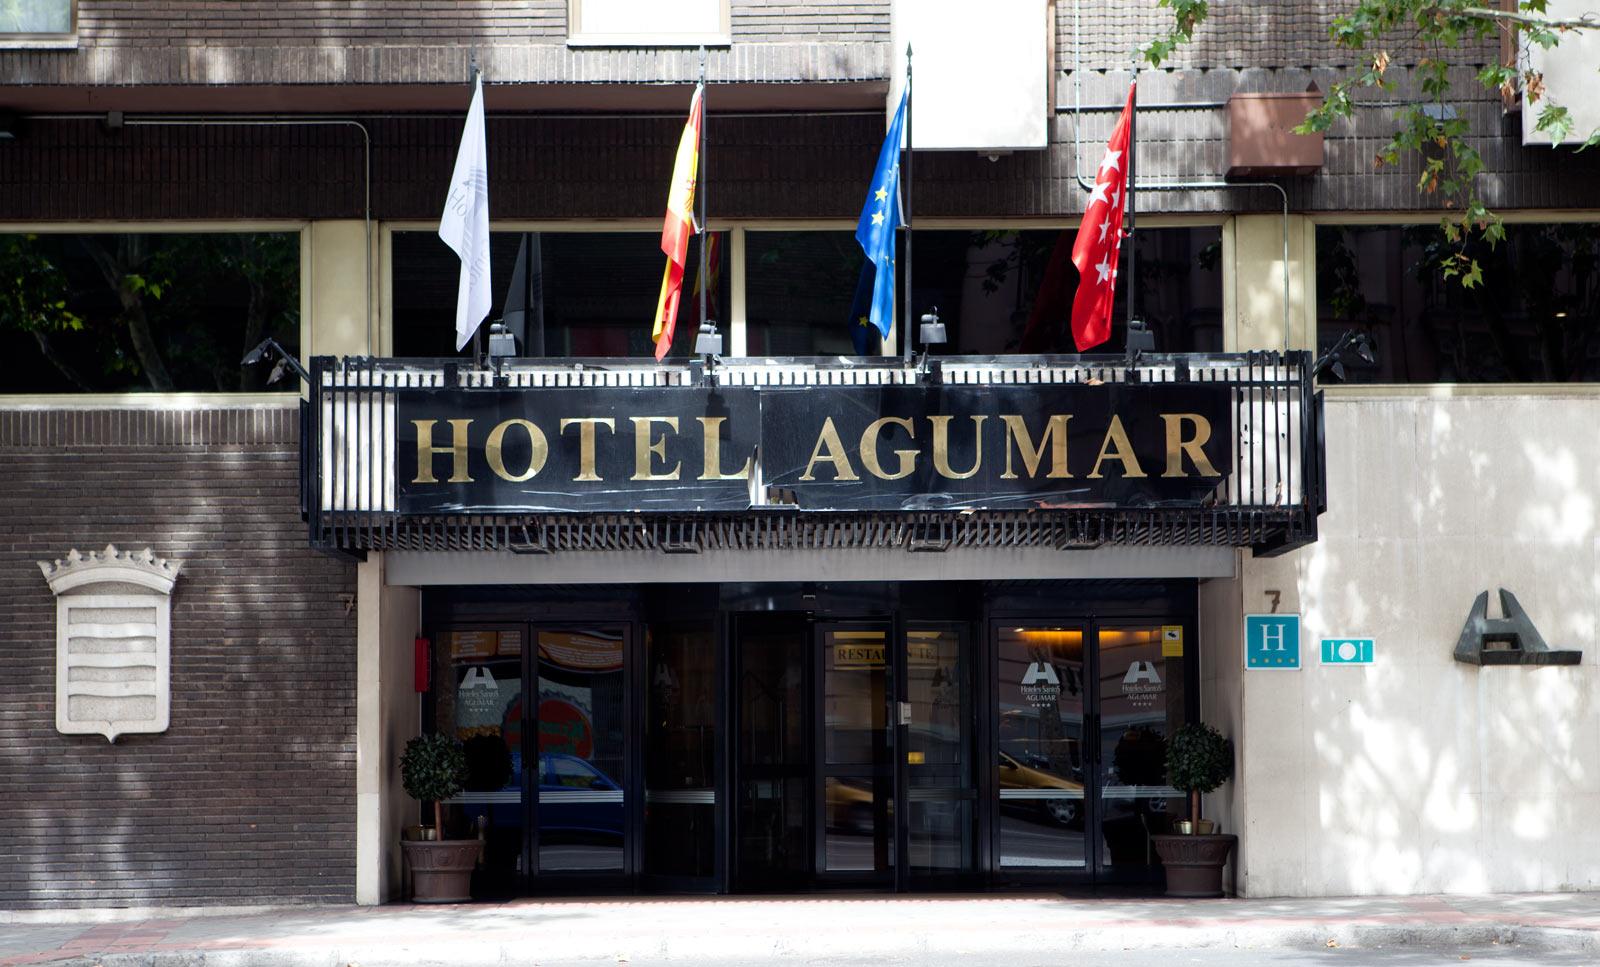 Fotos hotel santos agumar madrid web oficial - Hotel only you en madrid ...